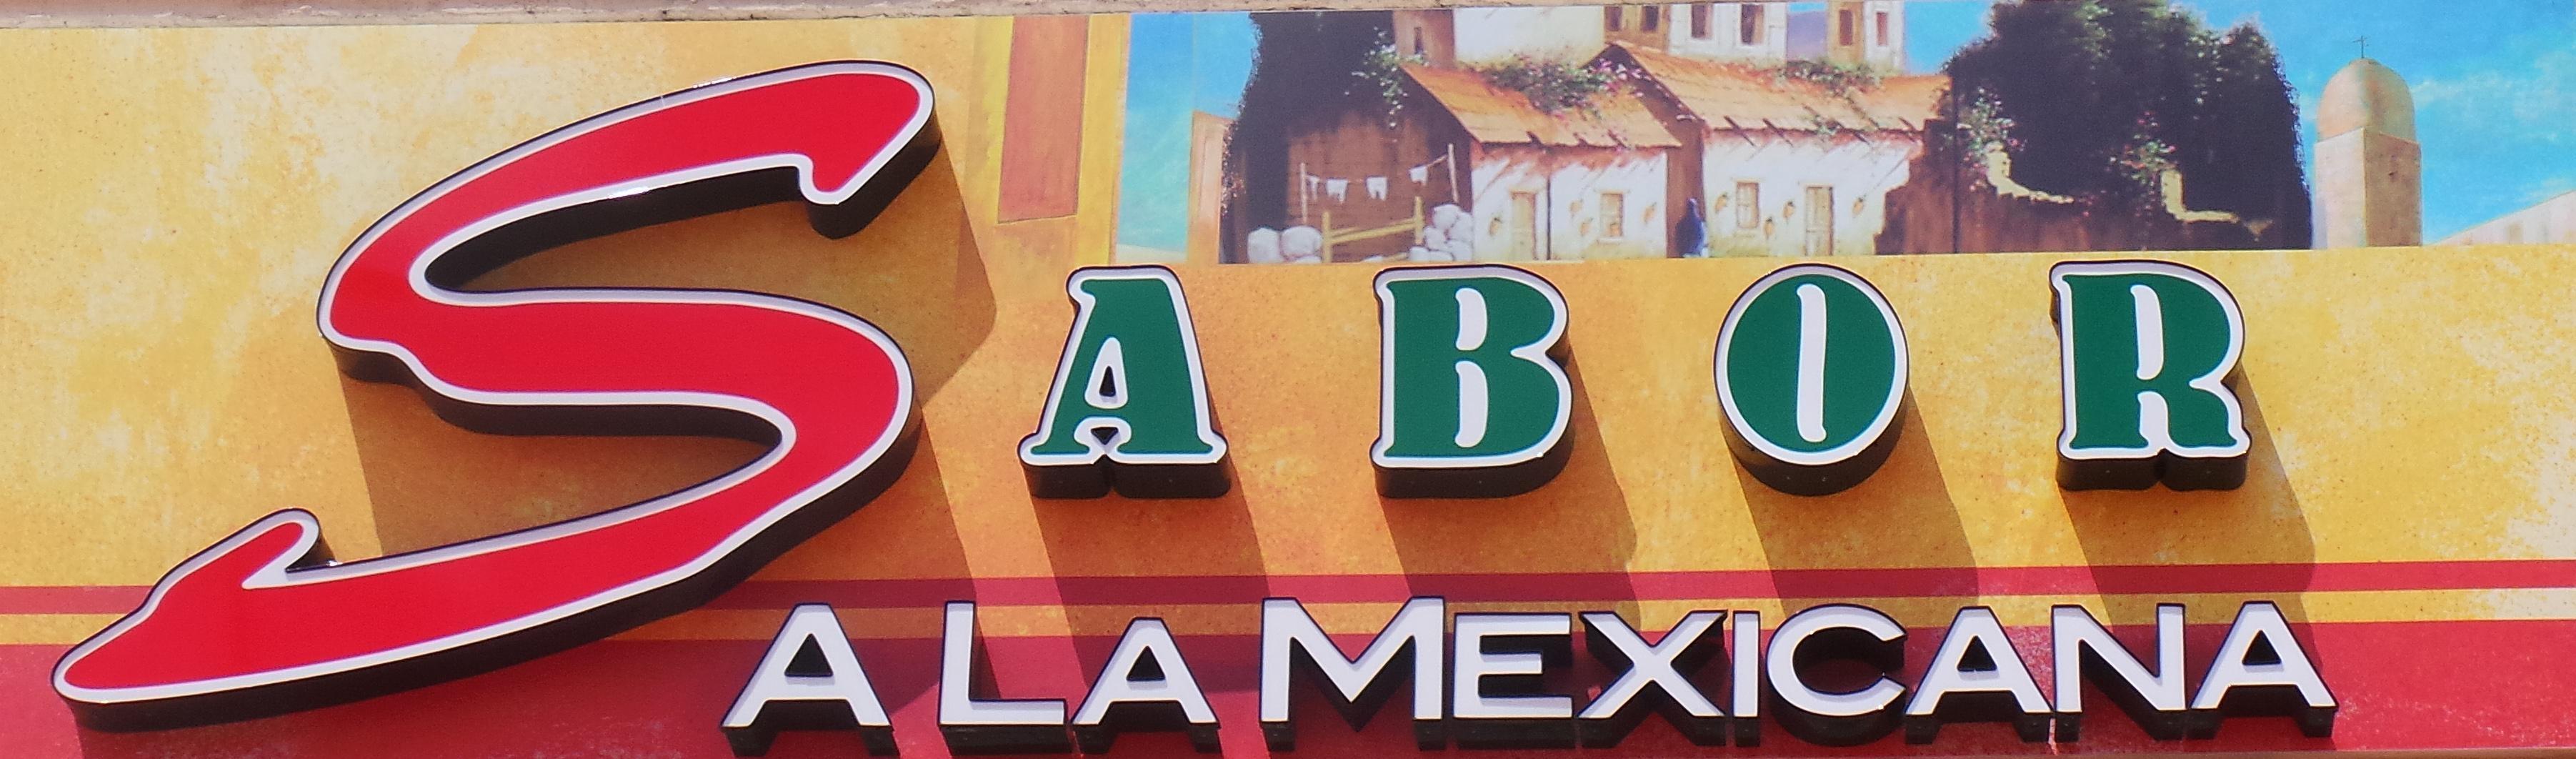 Sabor A La Mexicana Restaurant image 1